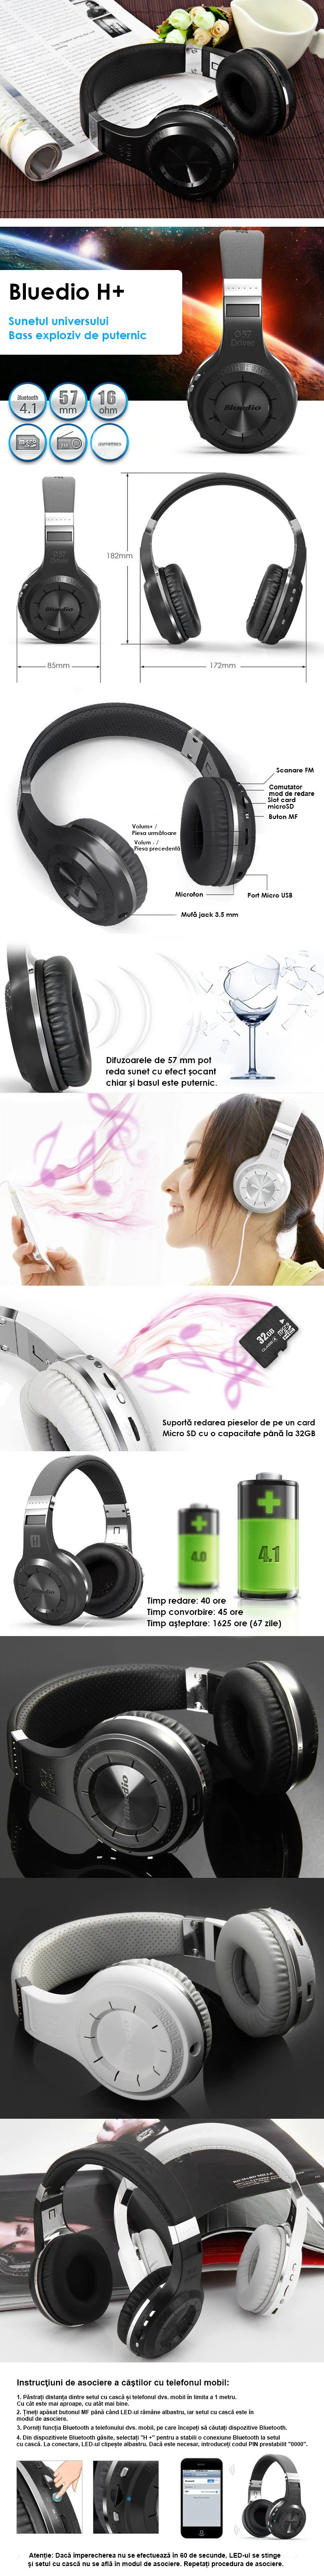 screencapture-dualstore-ro-home-1094-casti-bluetooth-bluedio-h-bluetooth-41-wireless-stereo-microfon-incorporat-microsd-fm-html-2018-10-03-17_16_07334769bf8ec91b05.jpg